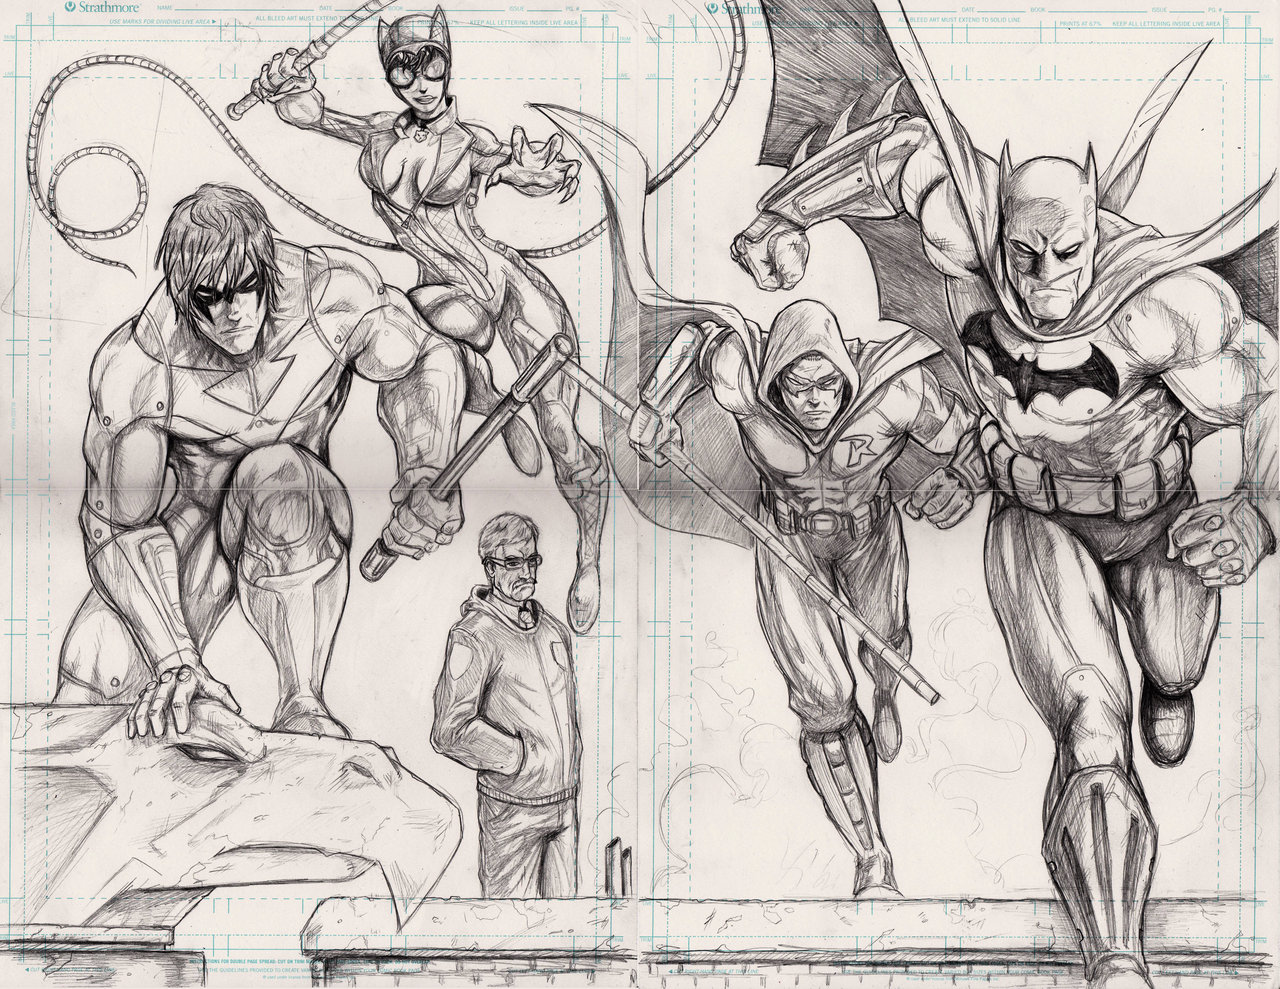 Drawn robin comic book superhero Character Comic Superhero Create Drawing